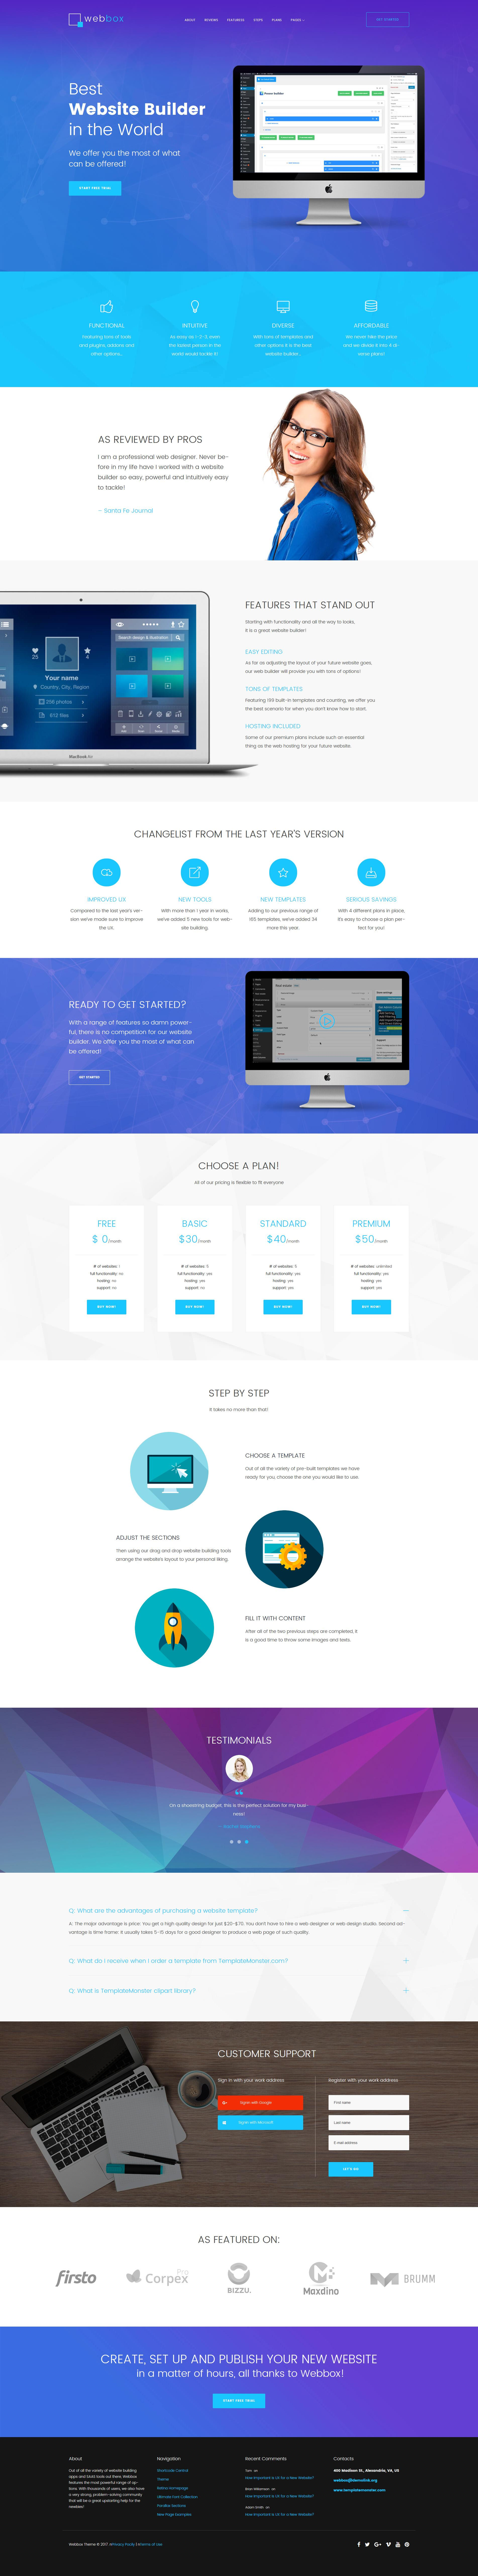 Webbox - One Page Product Landing Tema WordPress №63548